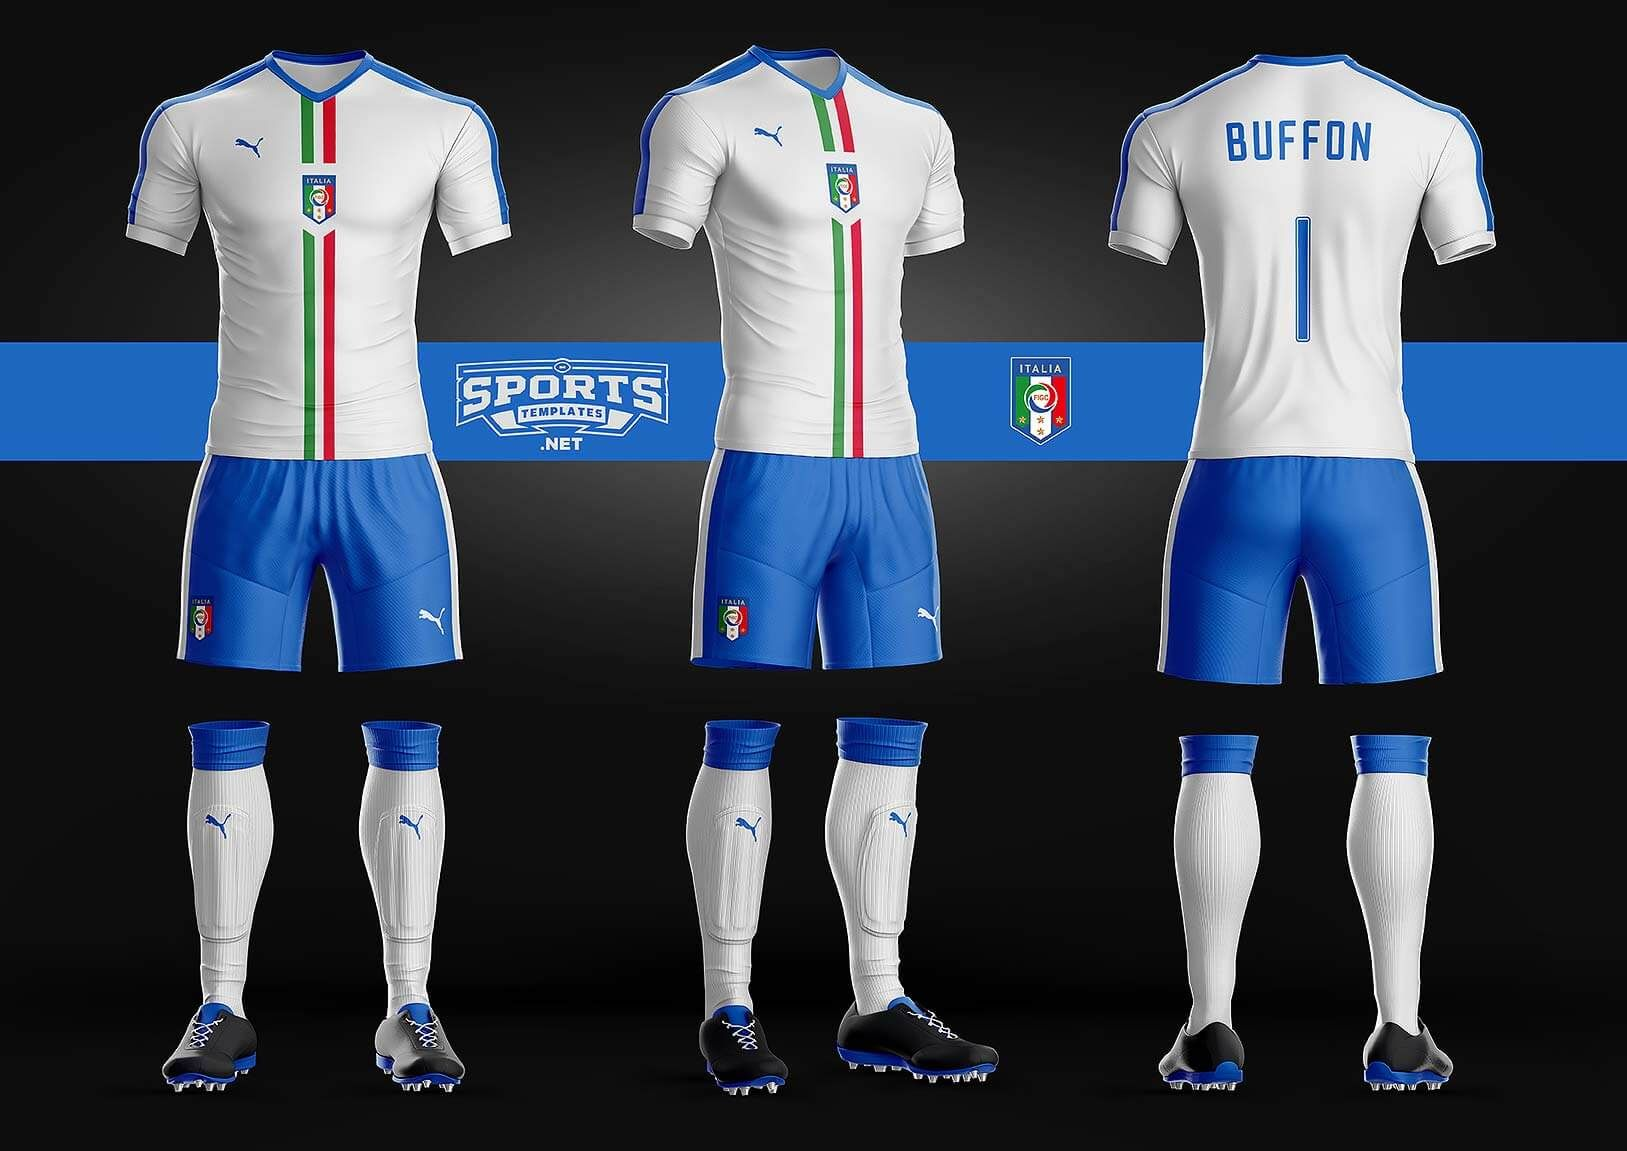 Goal Soccer Kit Template Sports Templates Soccer Kits Sports Uniform Design Soccer Uniforms Design